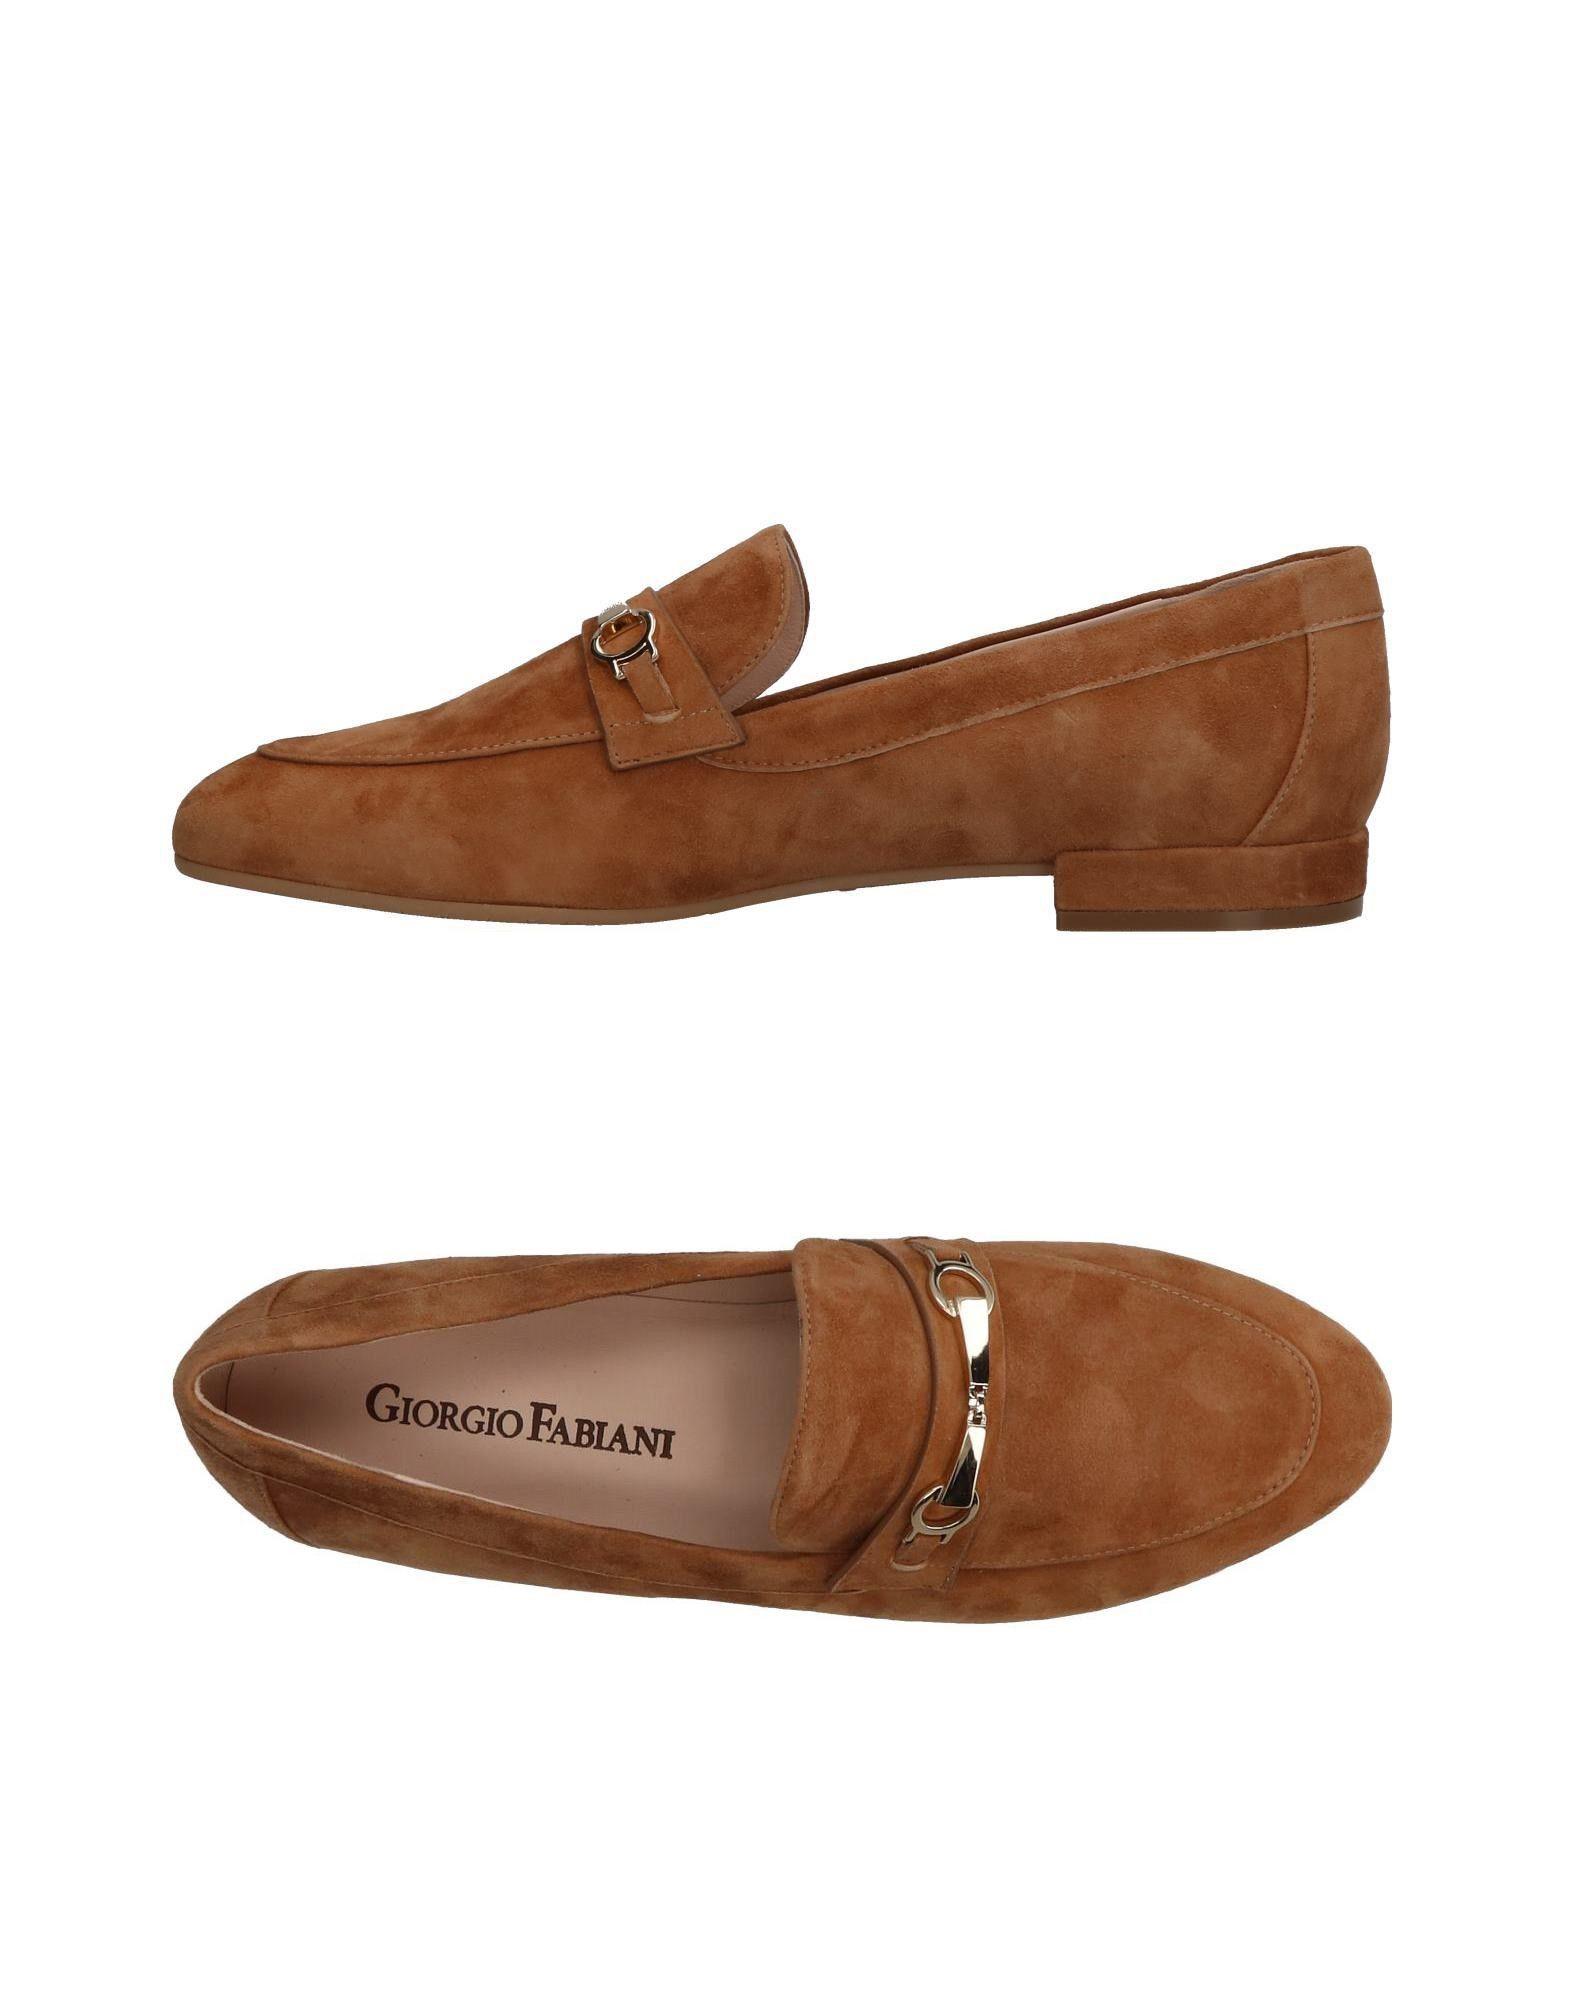 Giorgio Fabiani Mokassins Damen  11332941PX Gute Qualität beliebte Schuhe